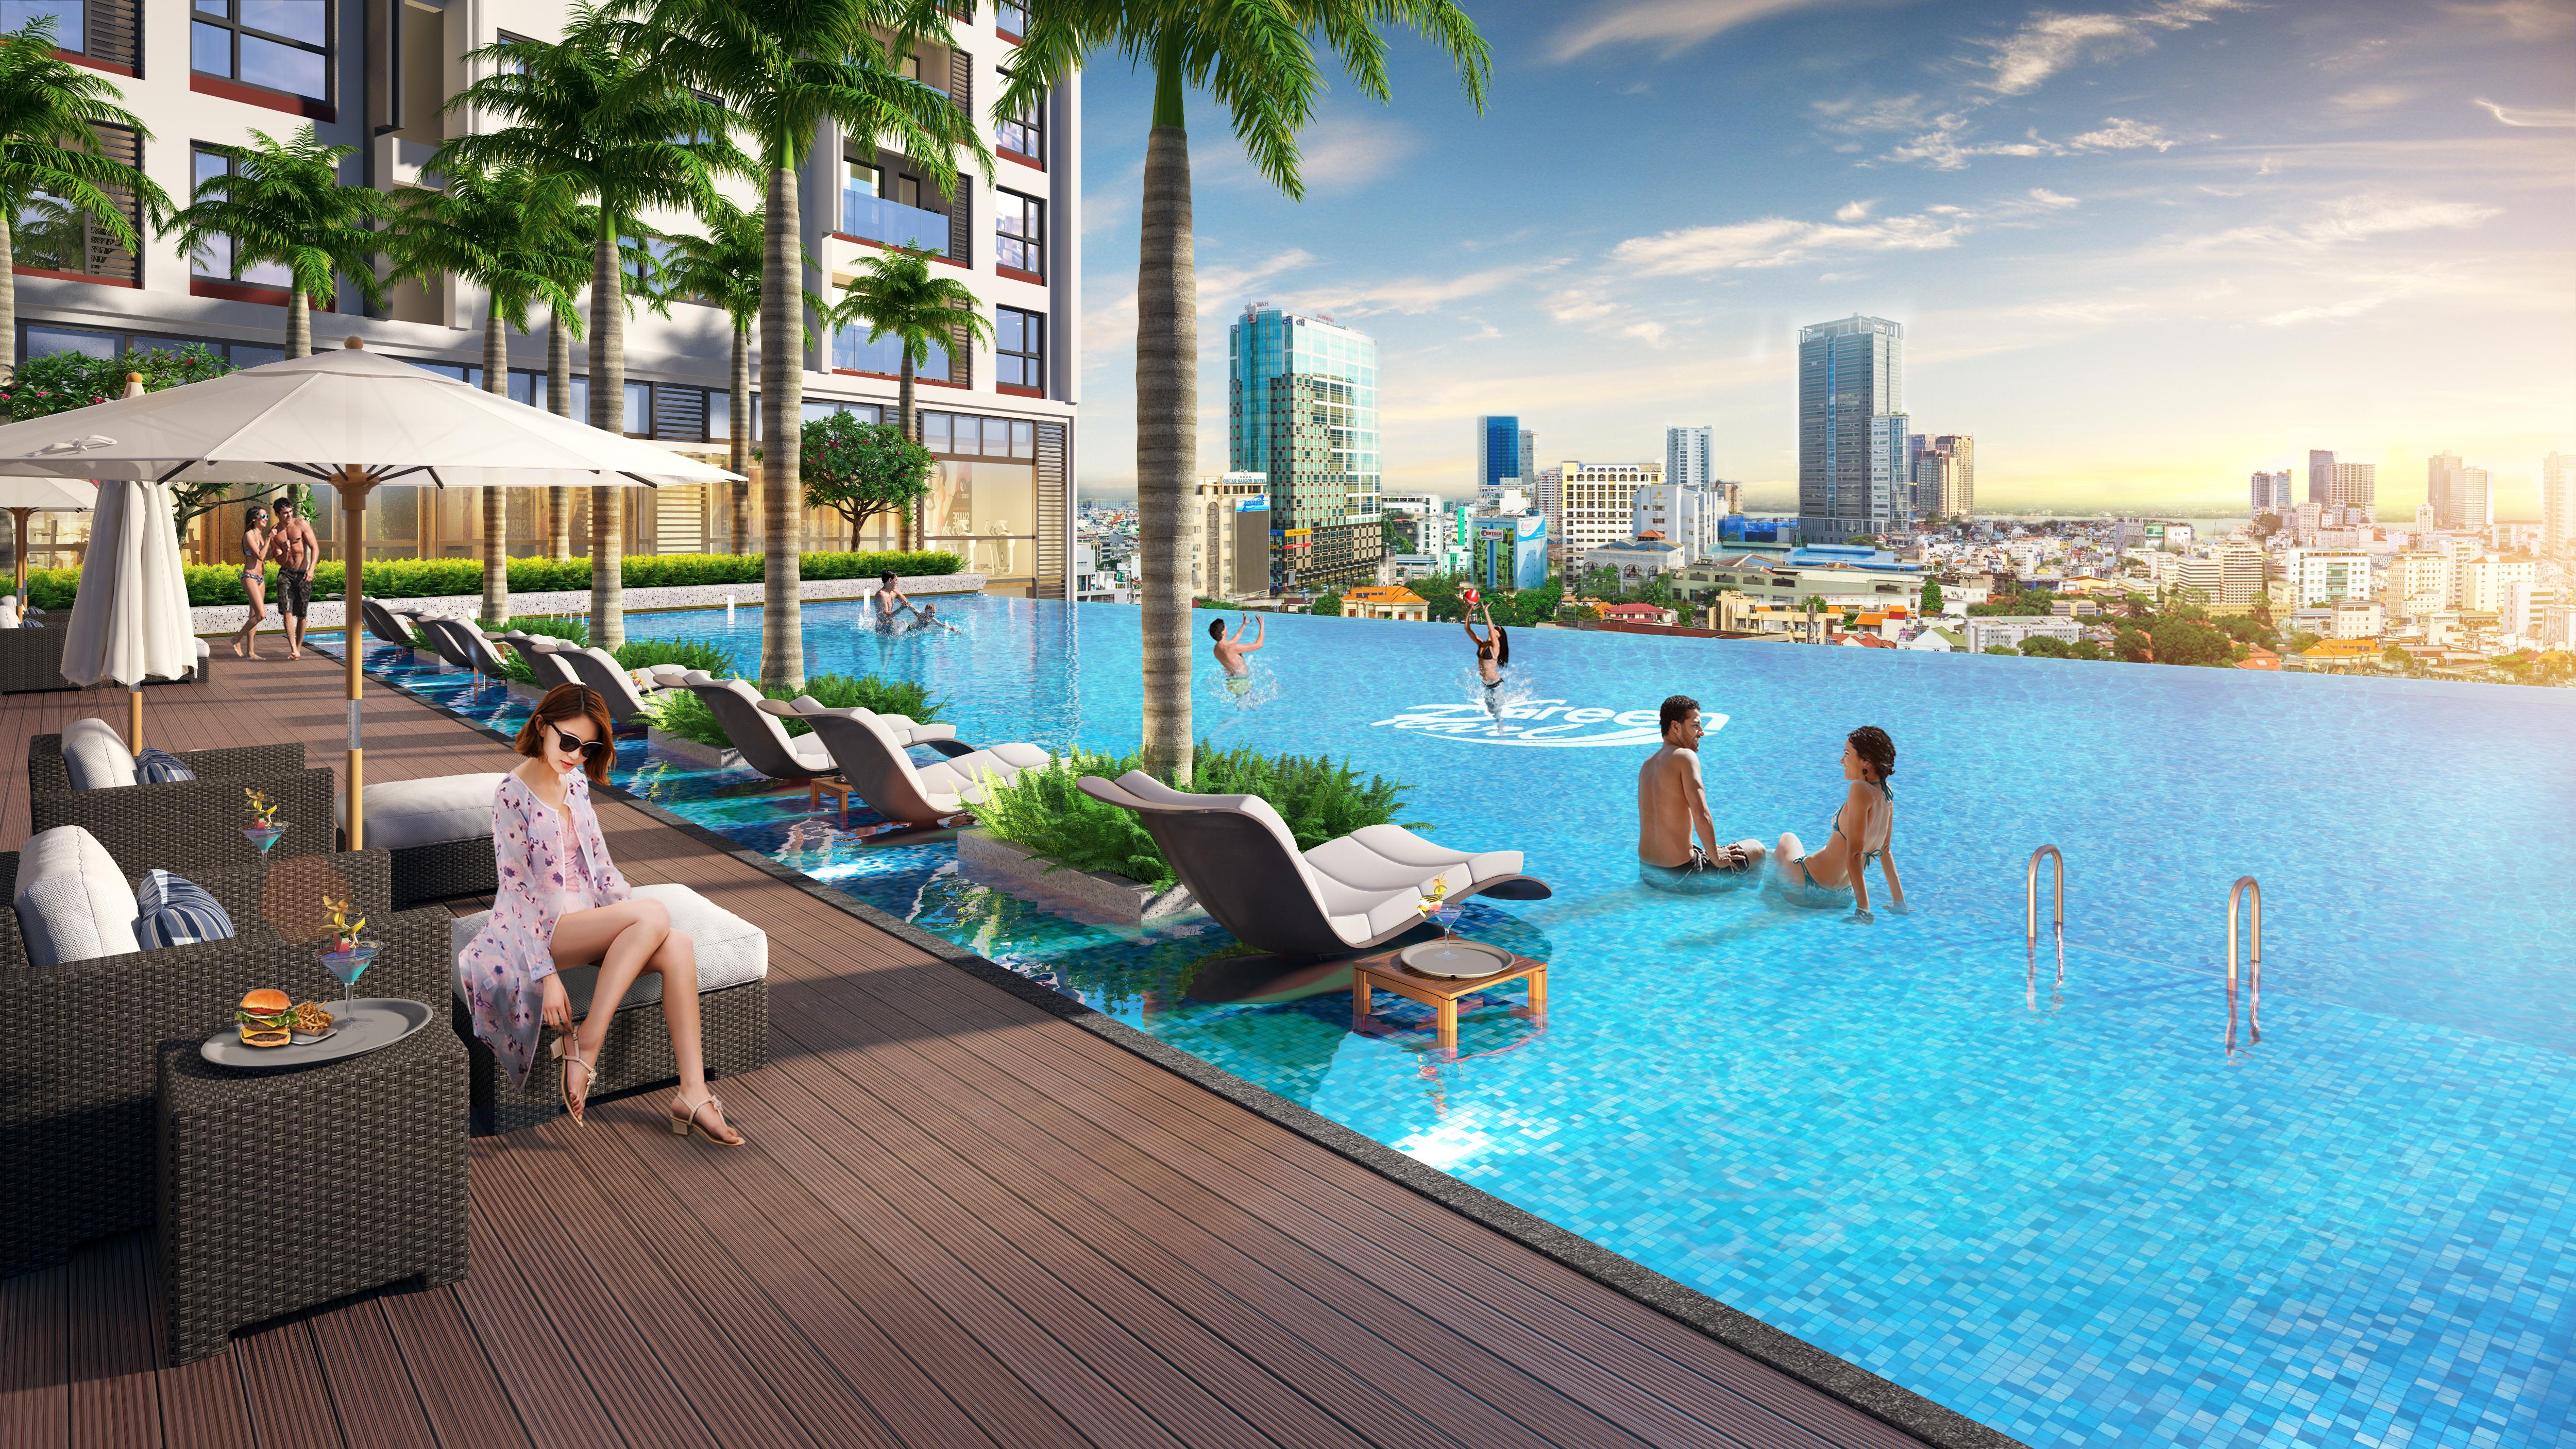 Bể bơi dự án 378 Minh Khai GreenPearl